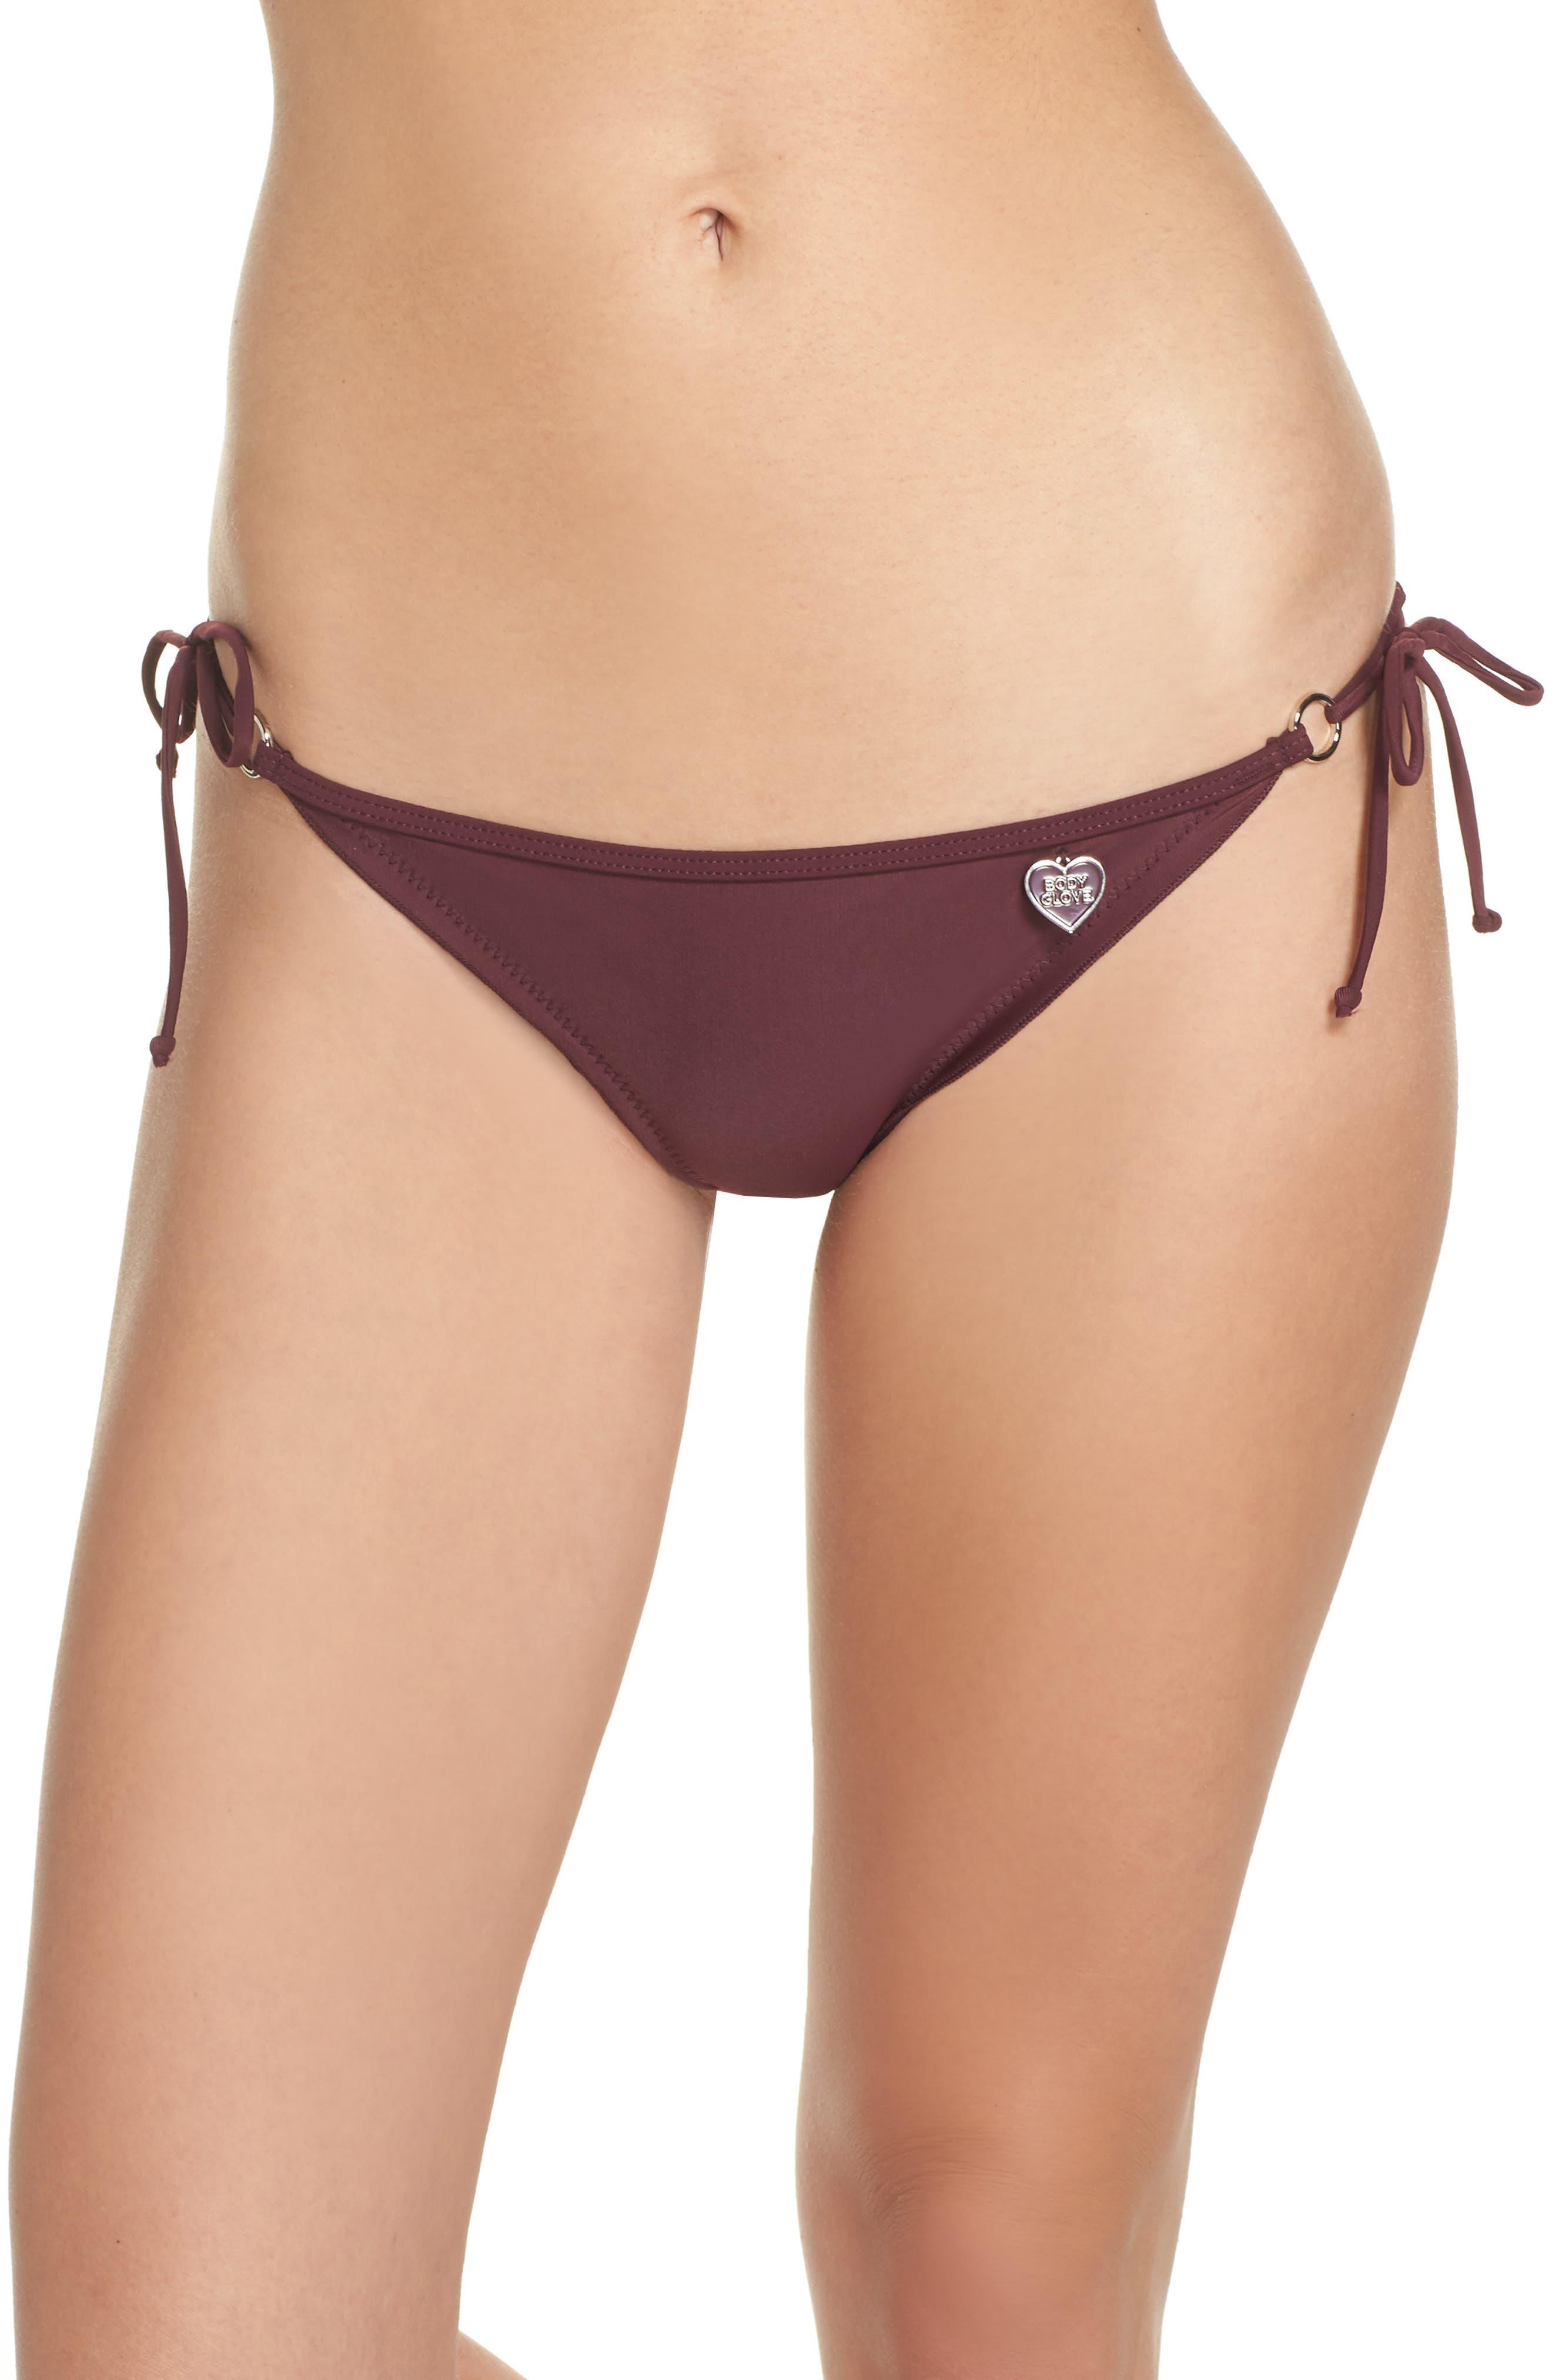 Body Glove 'Smoothies - Brasilia' Side Tie Bikini Bottoms